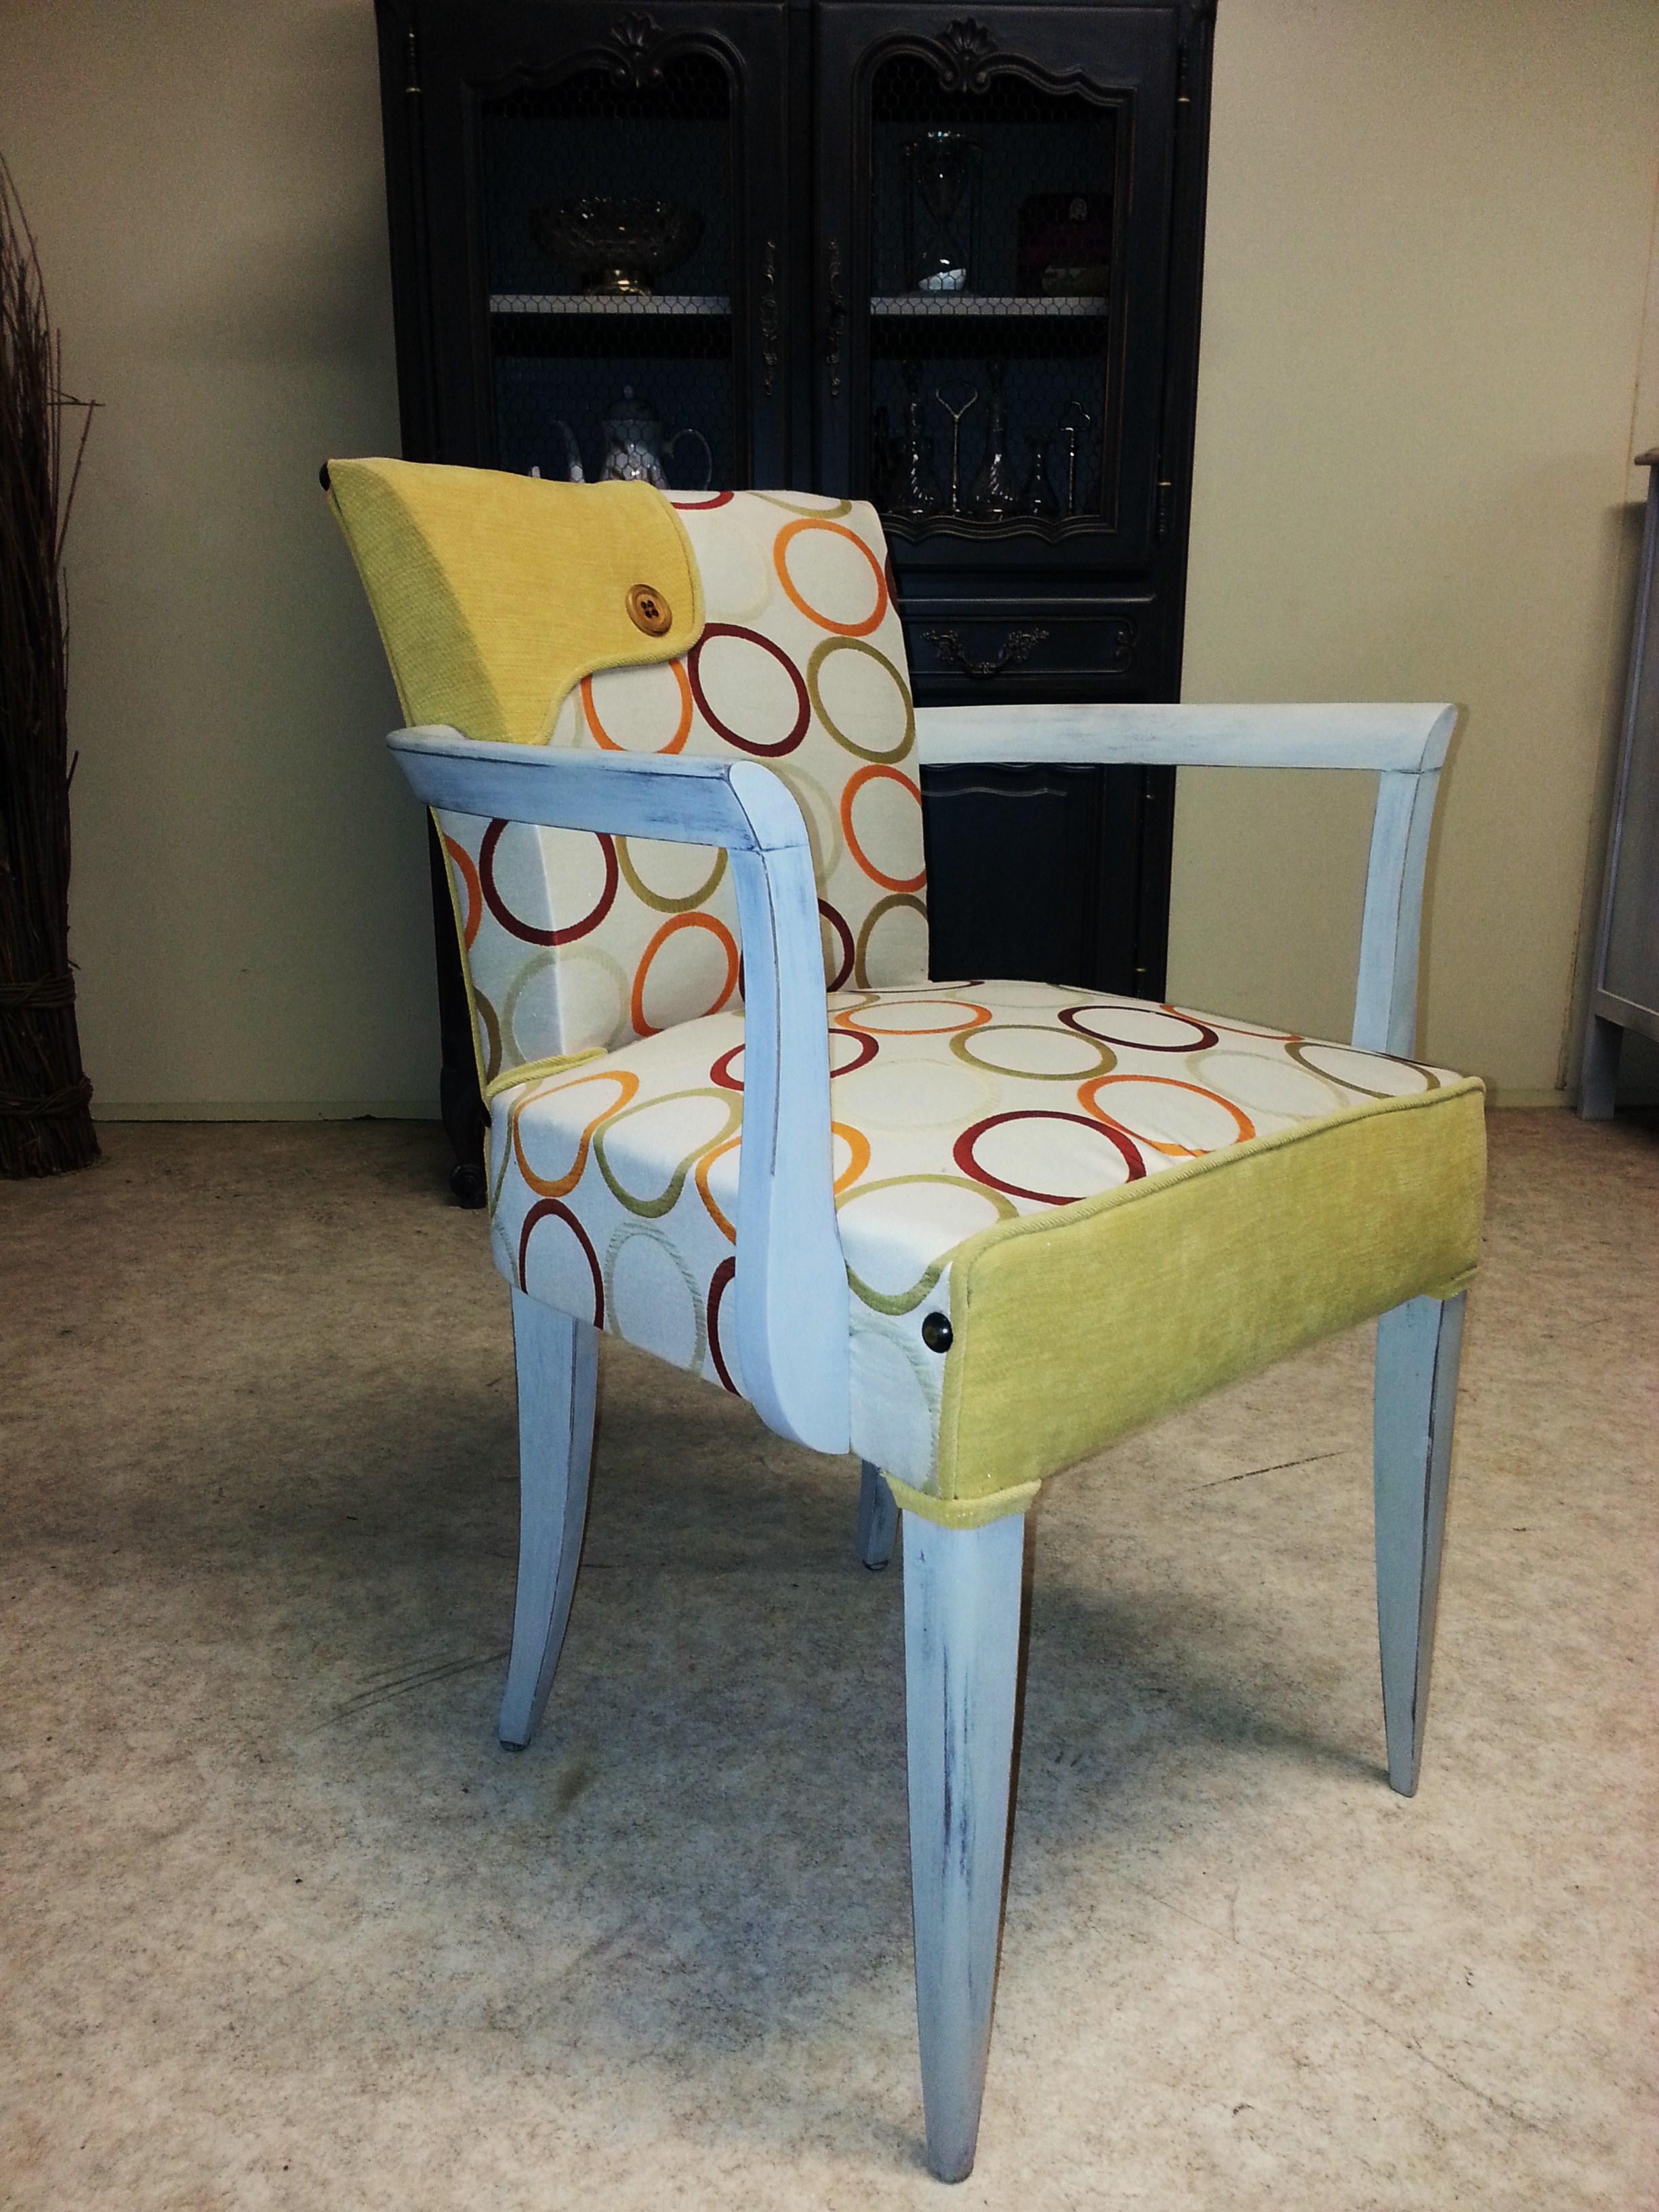 salon fauteuil canape page 4. Black Bedroom Furniture Sets. Home Design Ideas